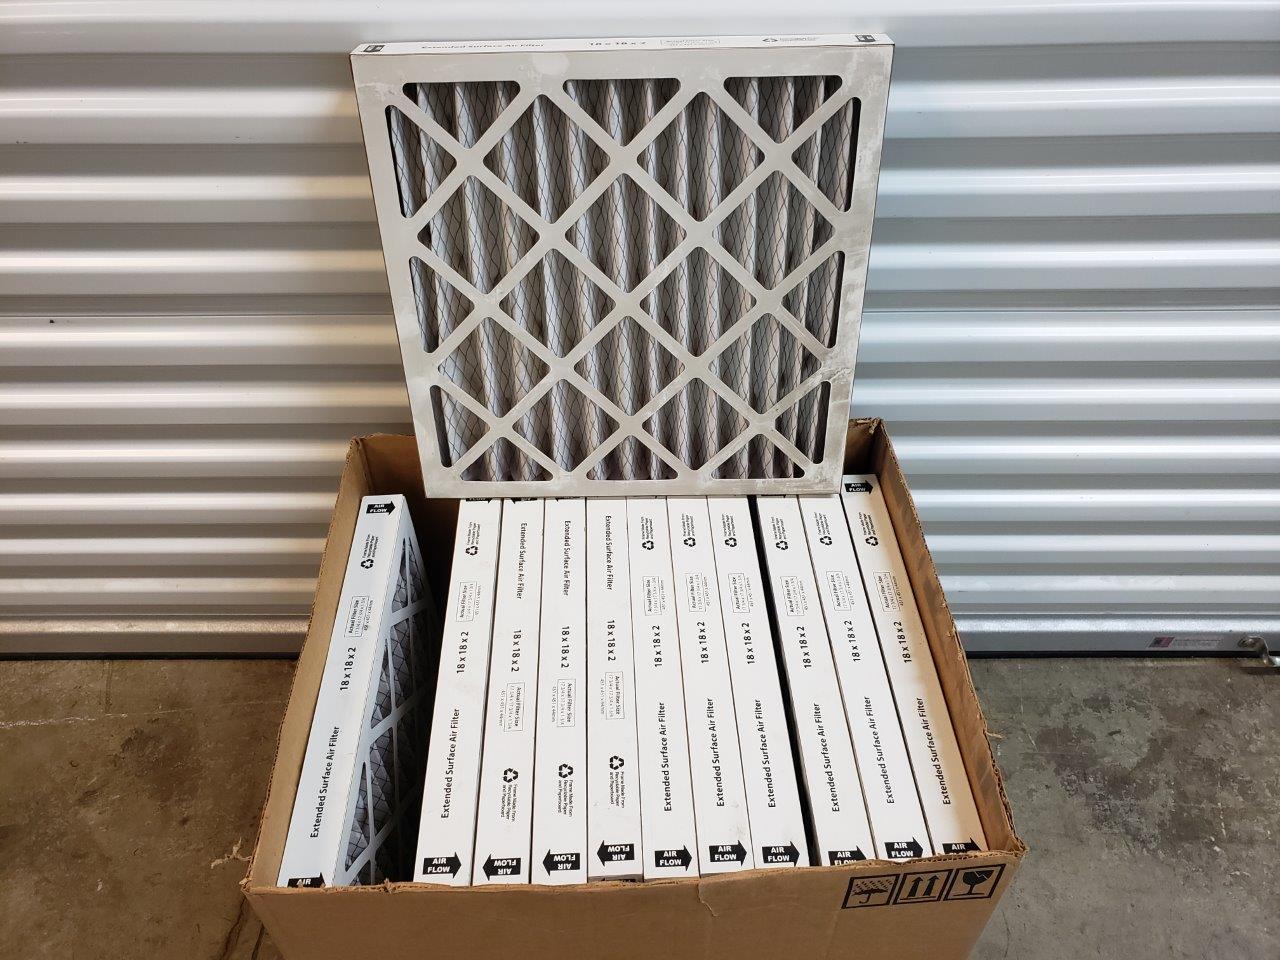 18x18x2 air filter, Purolator Hi 40 Extended Surface Pleated Air Filter MERV 8 (1 item)